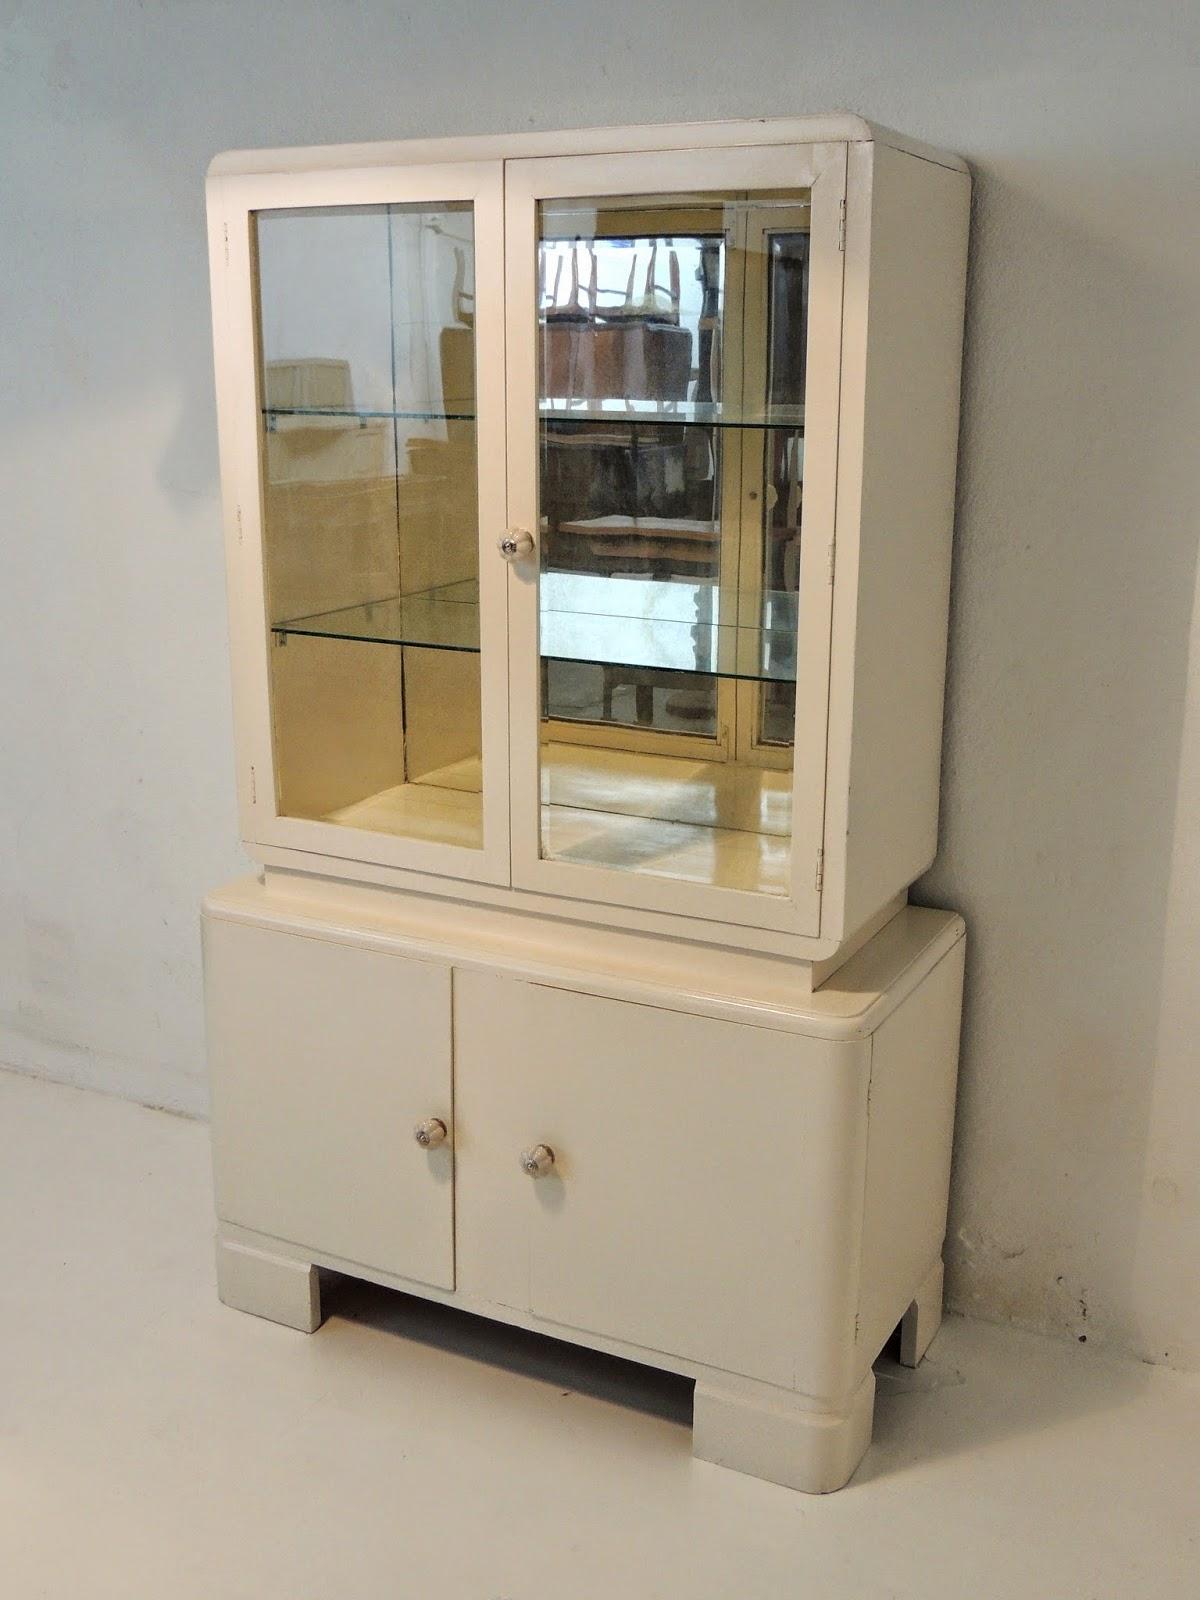 Antiguo bargue o aparador vitrina art deco en blanco valiente pepe - Aparador art deco ...